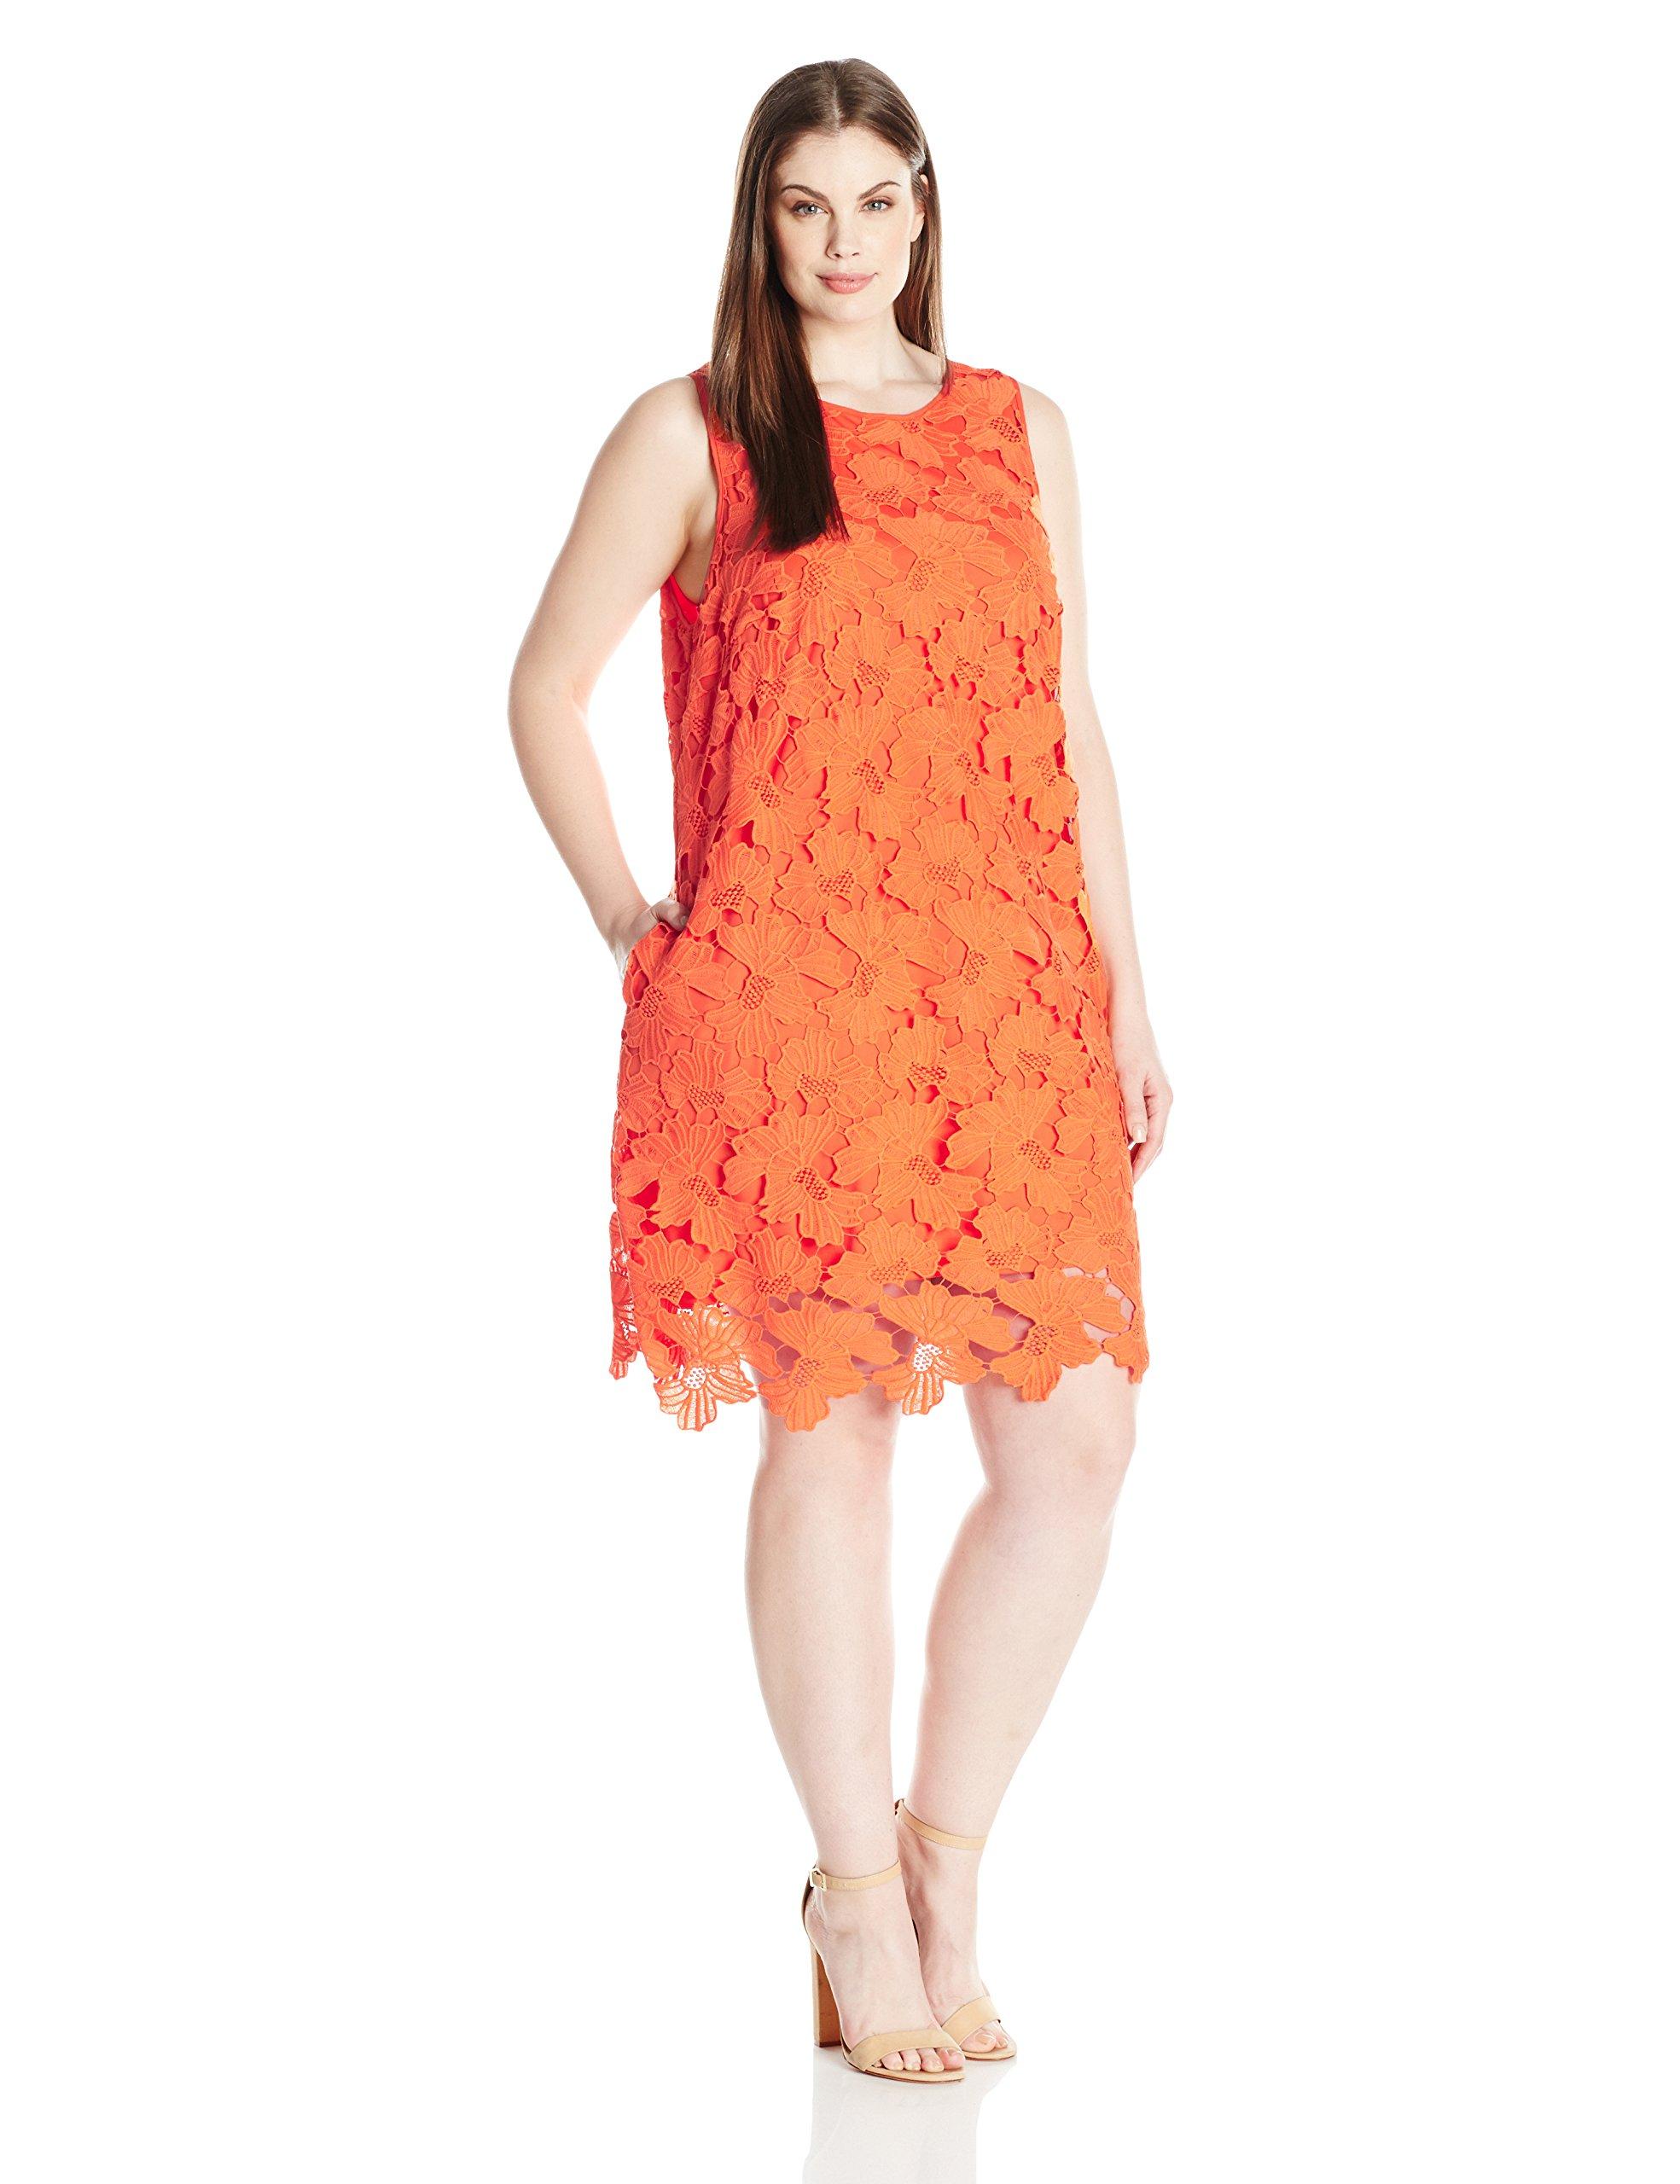 Julia Jordan Women's Plus Size Lace Shift Dress, Orange, 20W by Julia Jordan